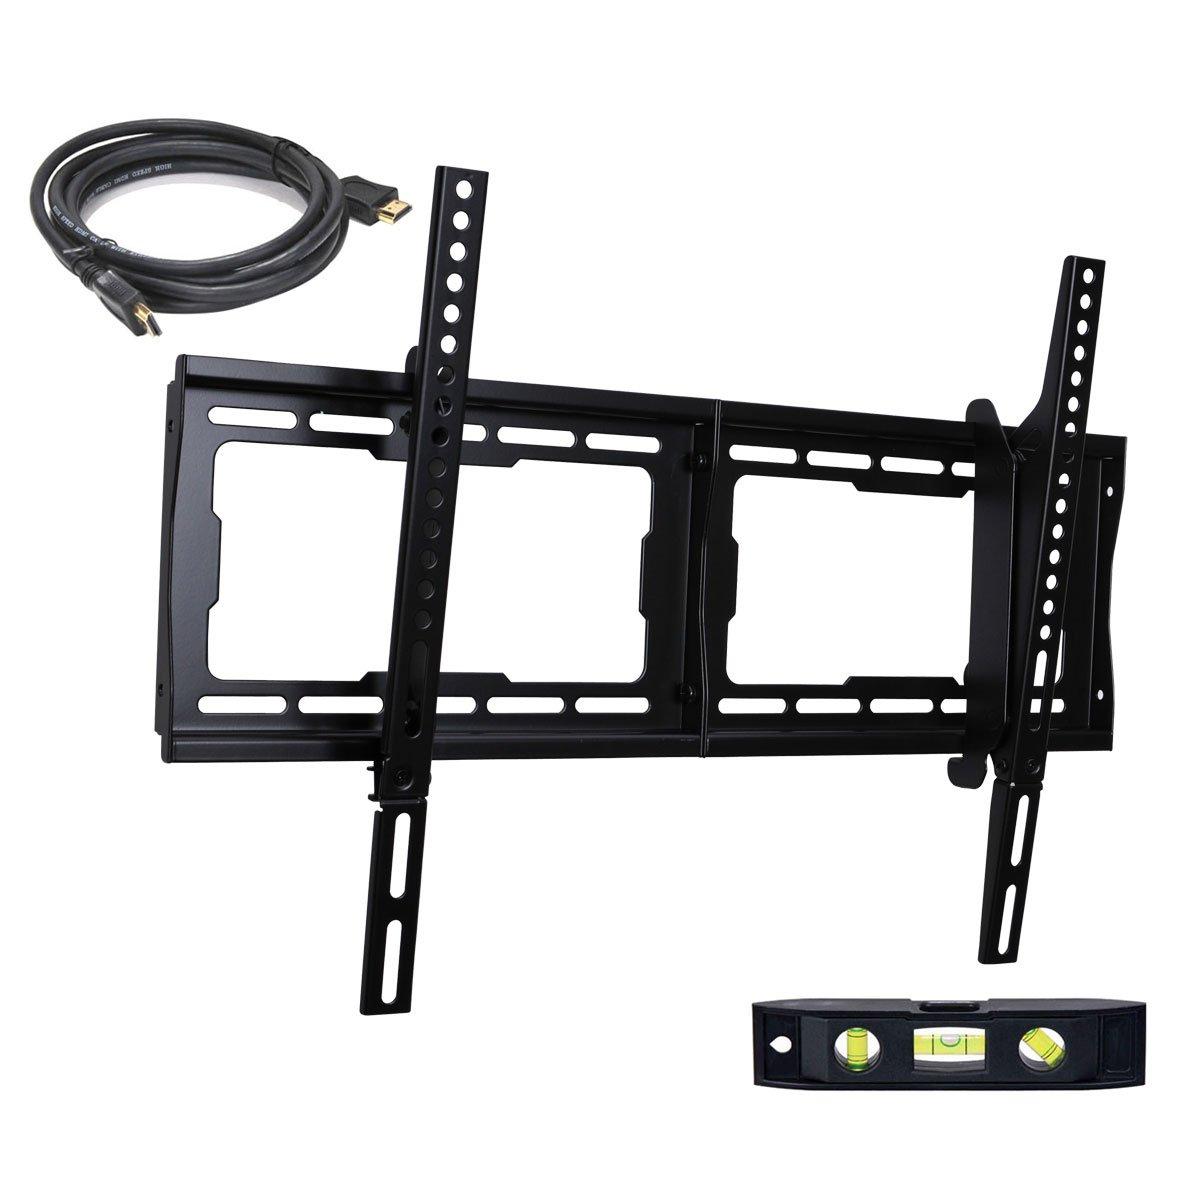 VideoSecu Flat Panel Tilt LCD LED 3D TV Wall Mount Fits most 32- 63 TVs for Panasonic TC-32LX14 TC-P42C2 TC-L42U12 TC-L32C12 TC-L32X1 TC-L37X1 TC-L37S1 TC-L37G1 TC-L32S1 LED HDTV- VESA Compatible up to 600x400 BG3 tc helicon voicetone double бу